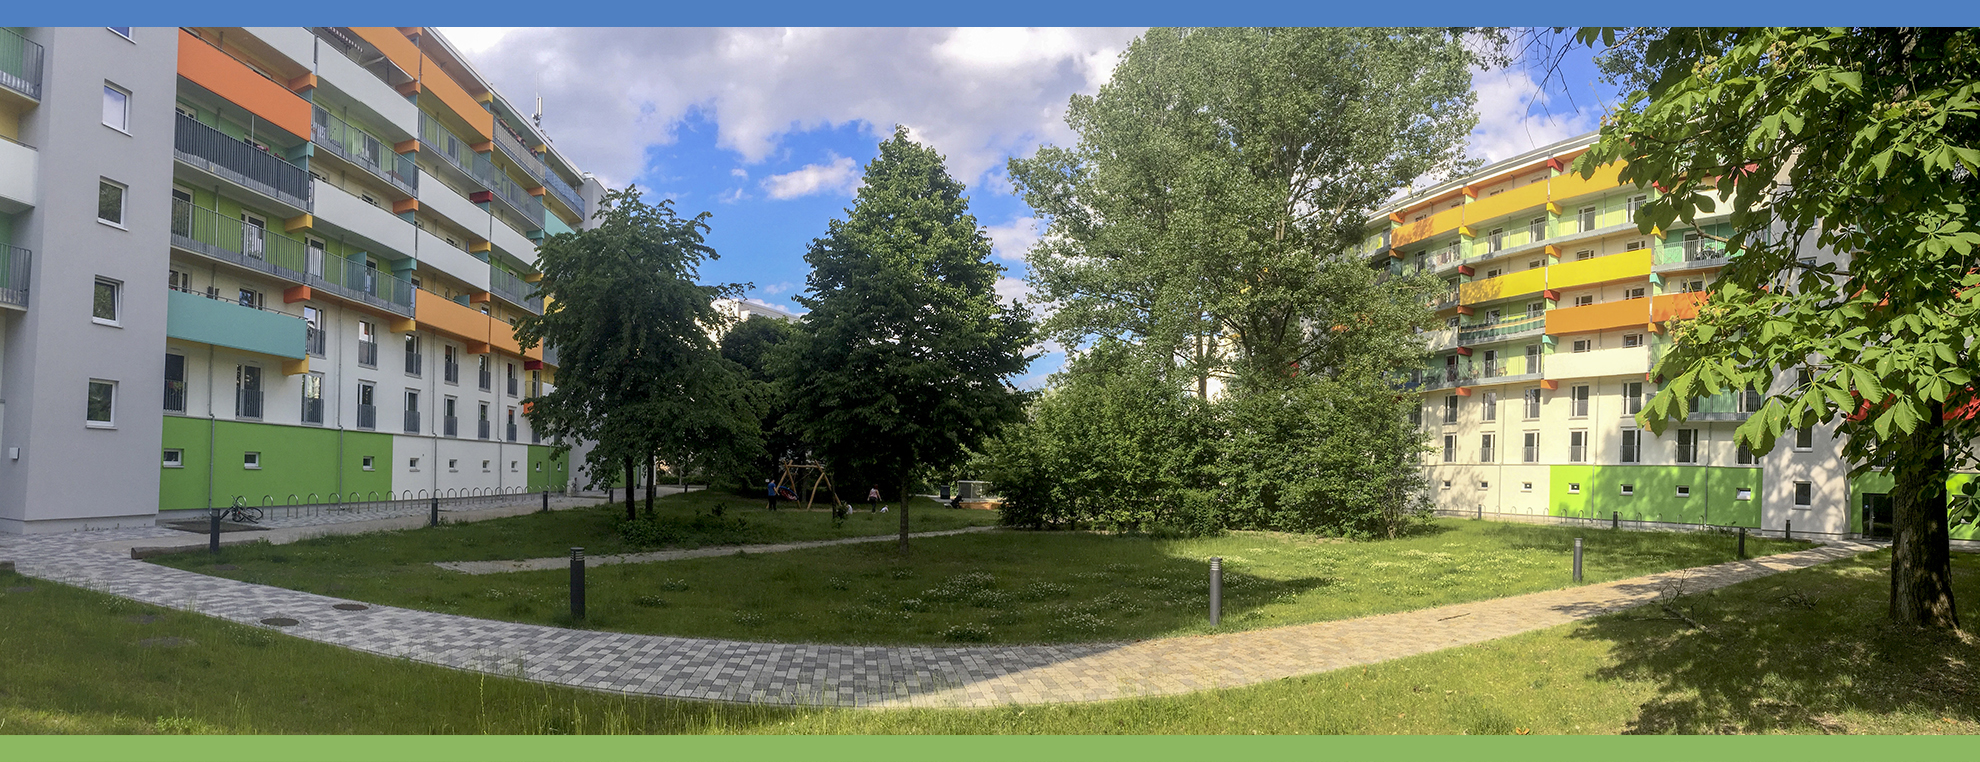 ALBATROS MVZ & RPK gGmbH, Einsatzort: Röttkenring 27, 13053 Berlin